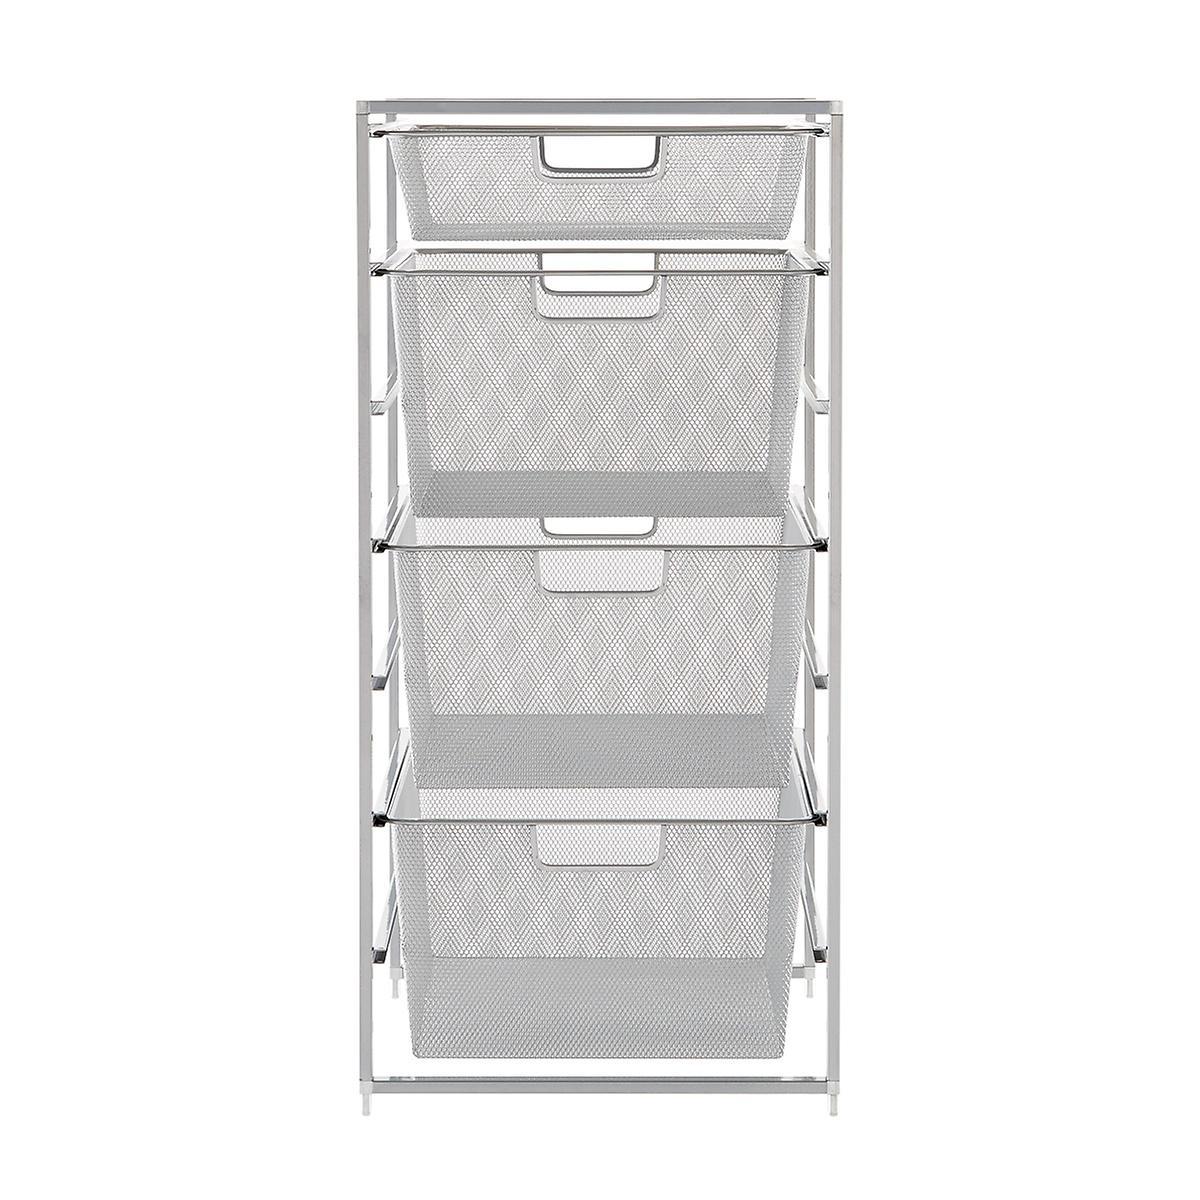 Platinum elfa Drawer Frames